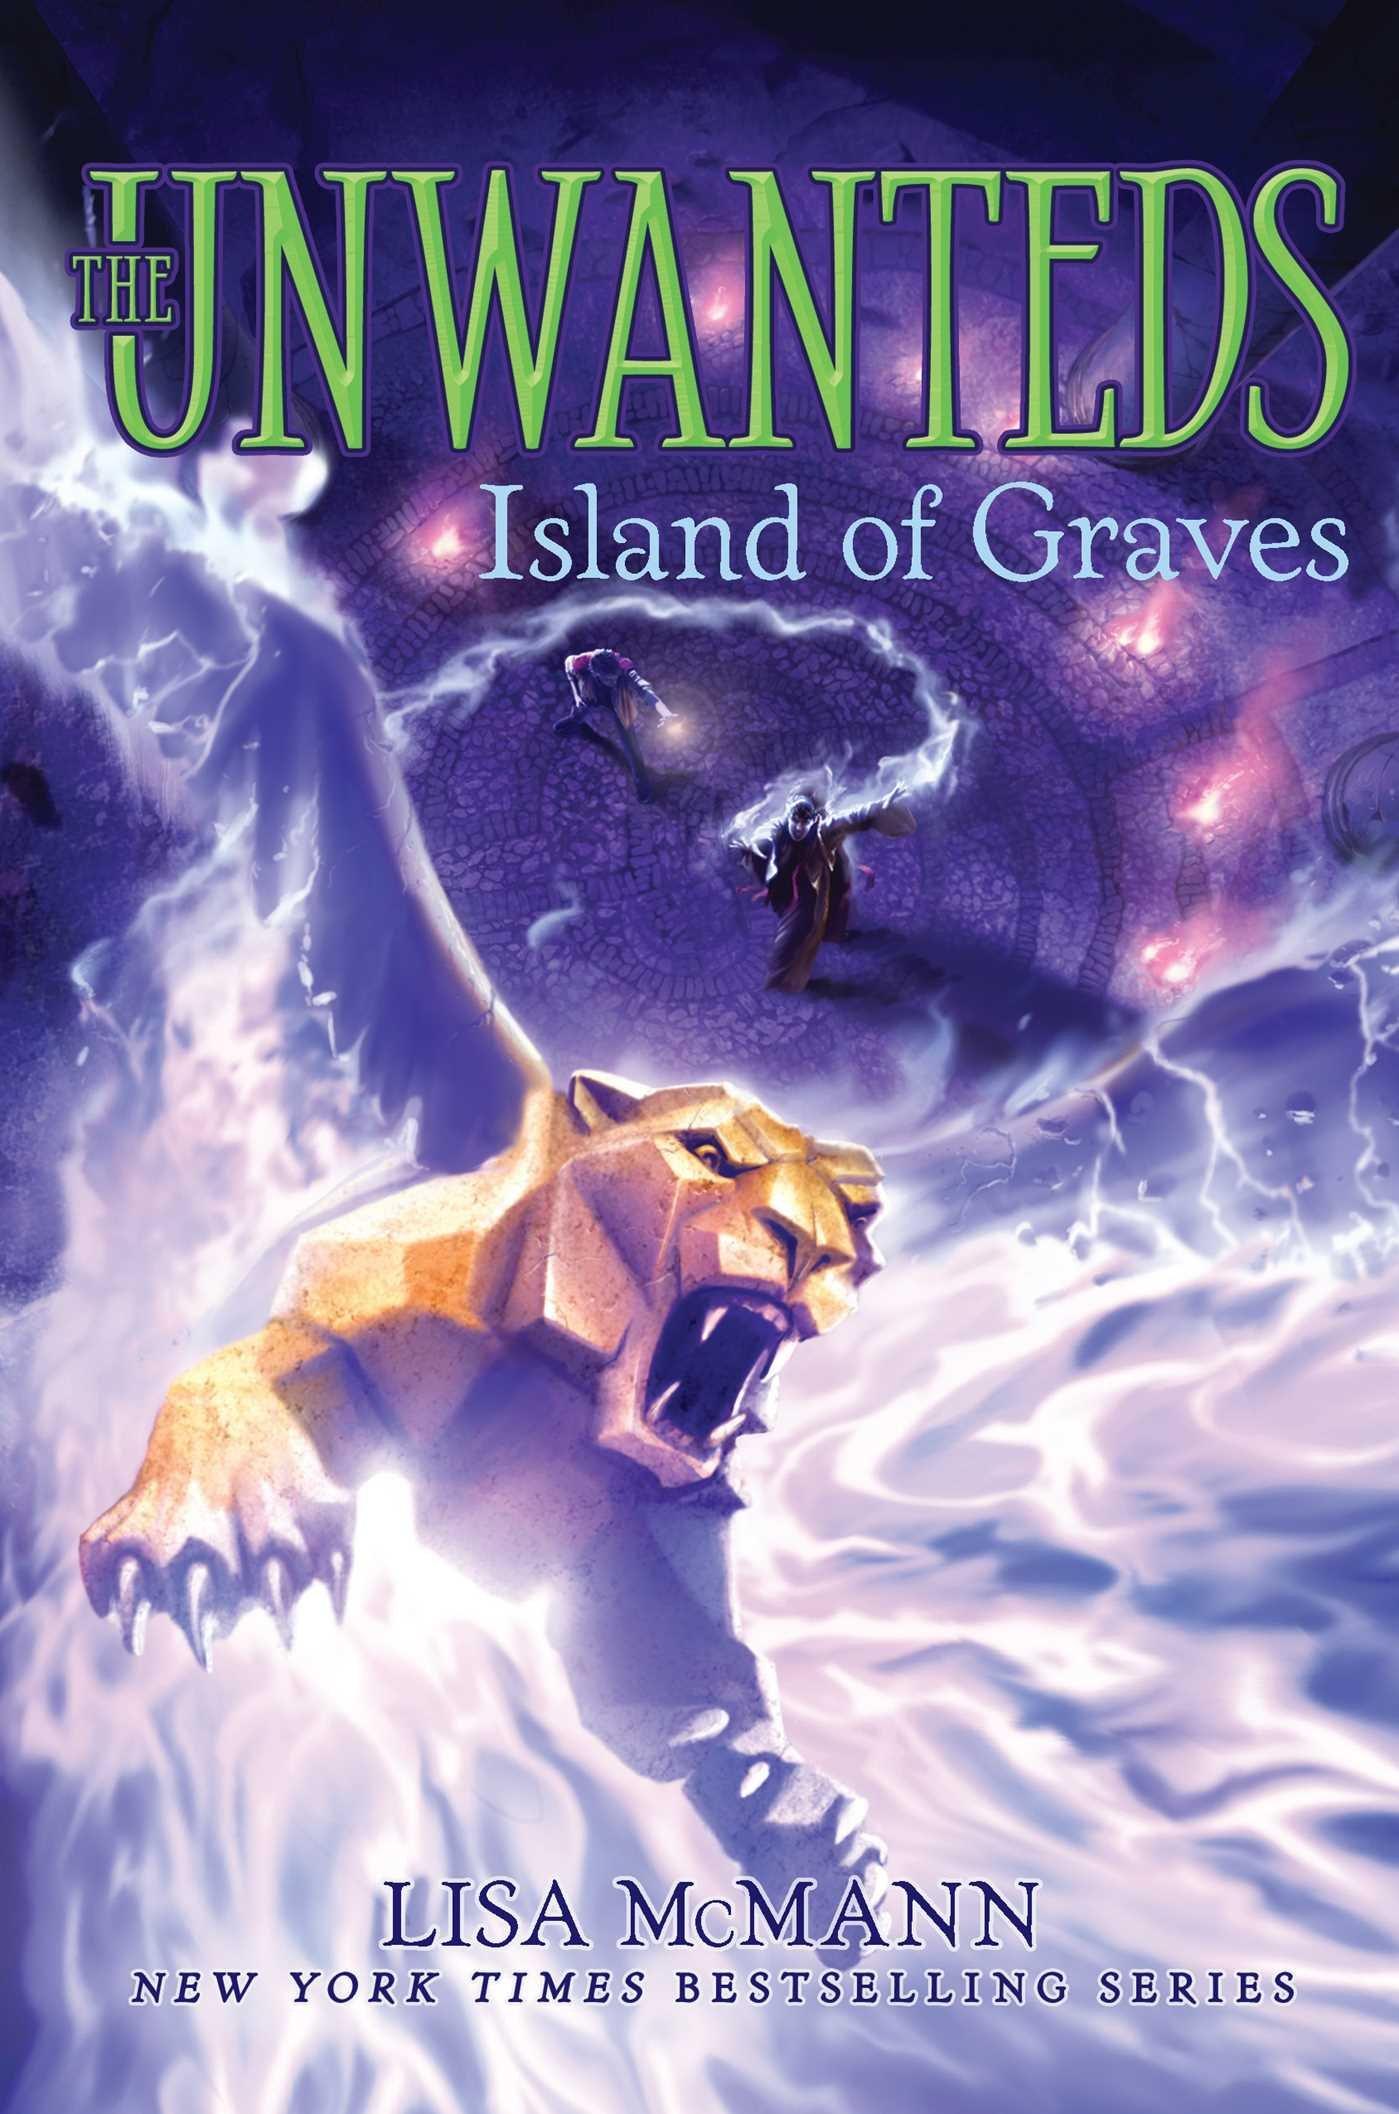 Island of Graves (The Unwanteds): Lisa McMann: 9781442493353: Amazon.com:  Books